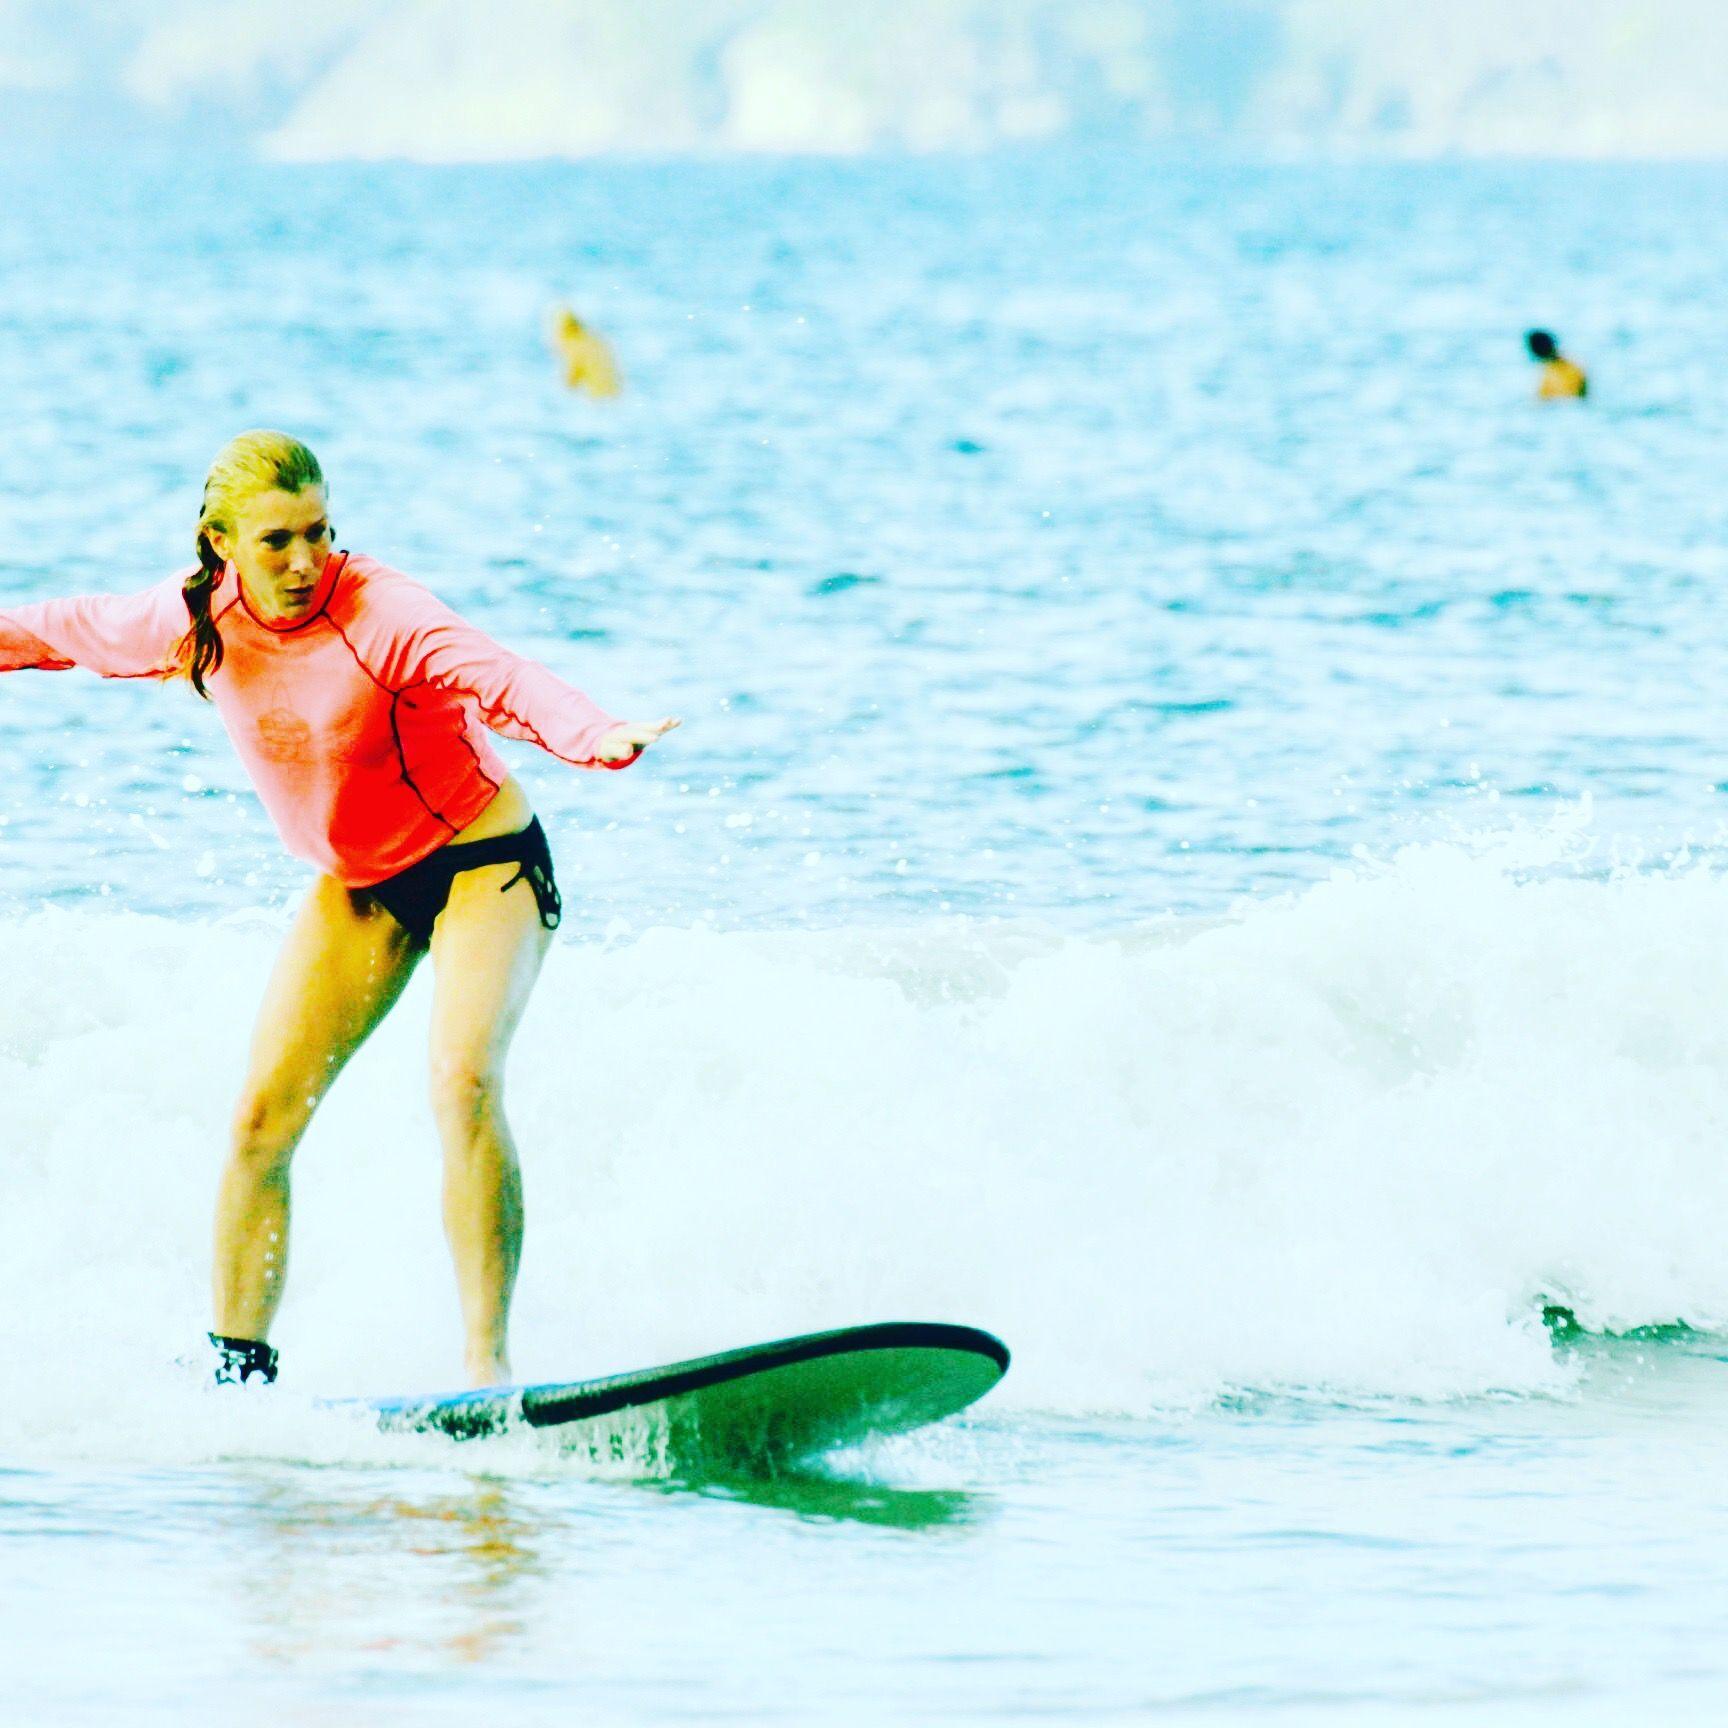 Surfing Playa Tamarindo in Costa Rica